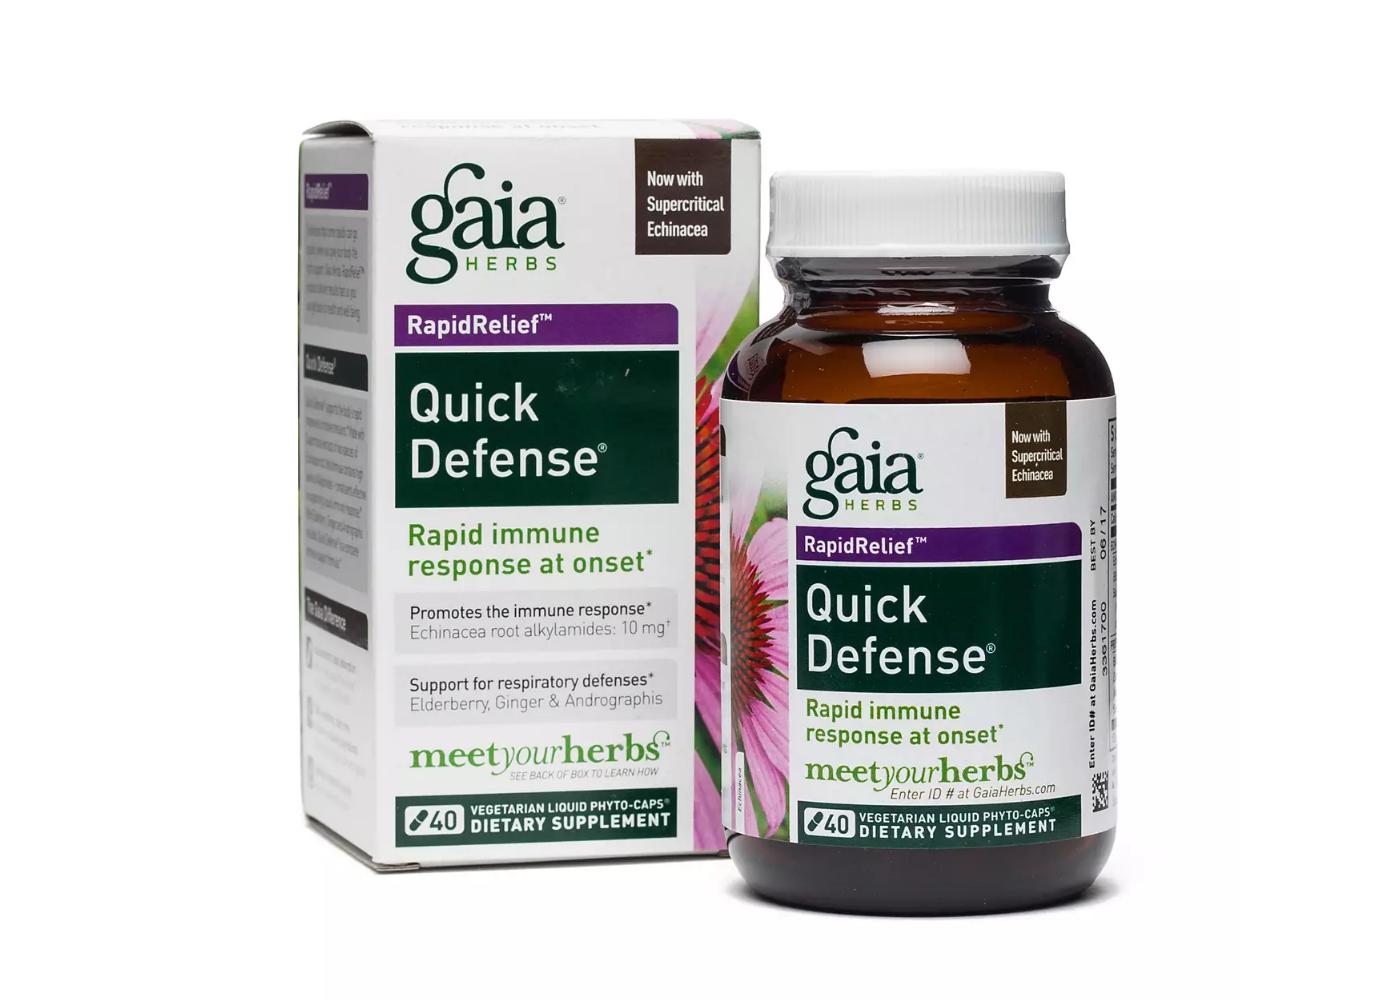 Gaia Herbs Quick Defense